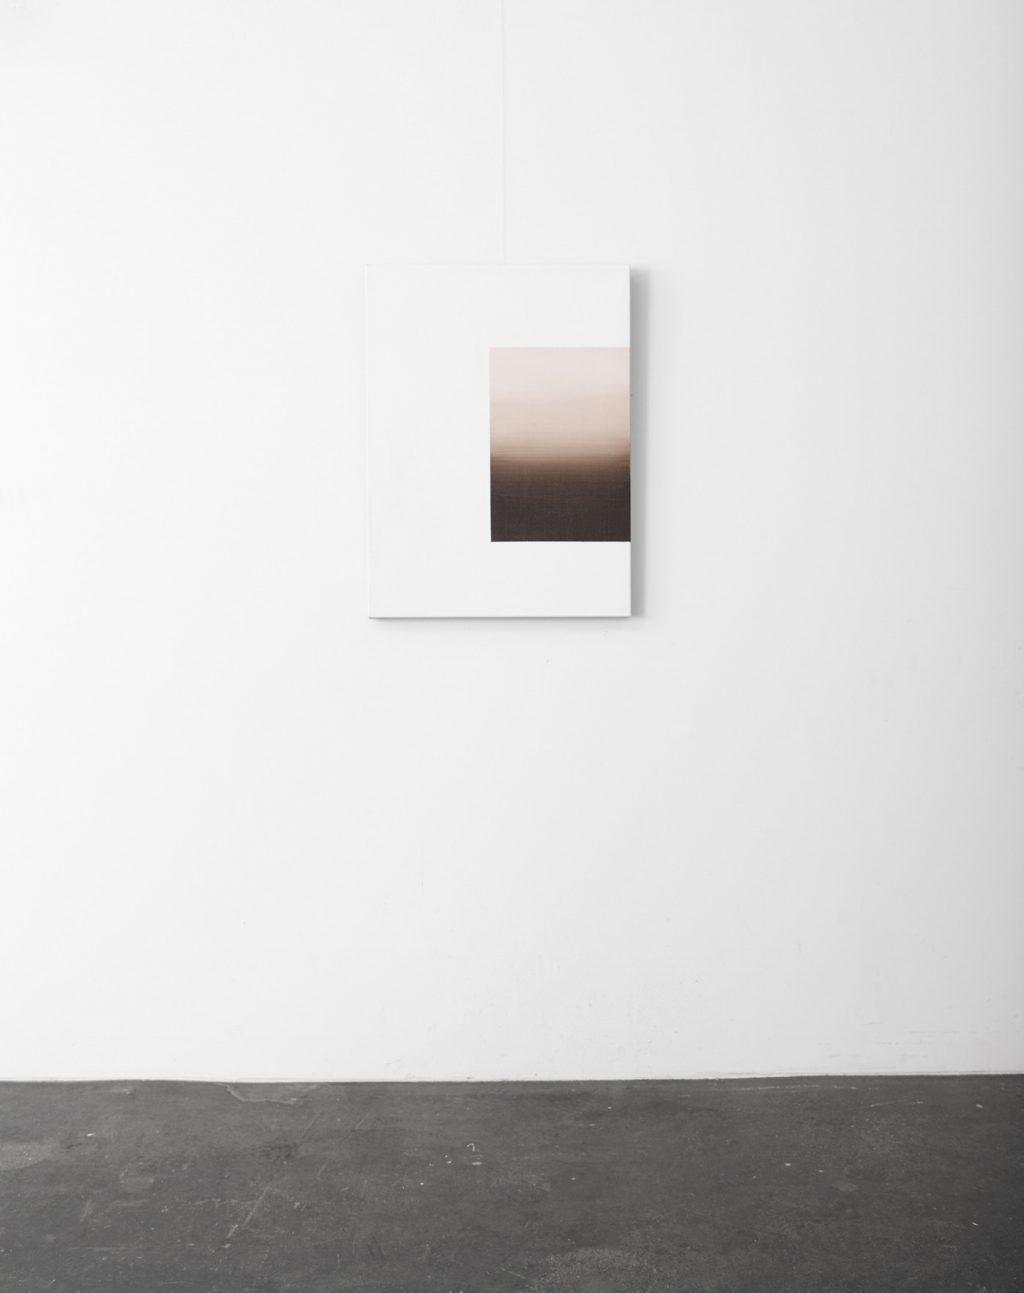 Untitled #20 – 2015